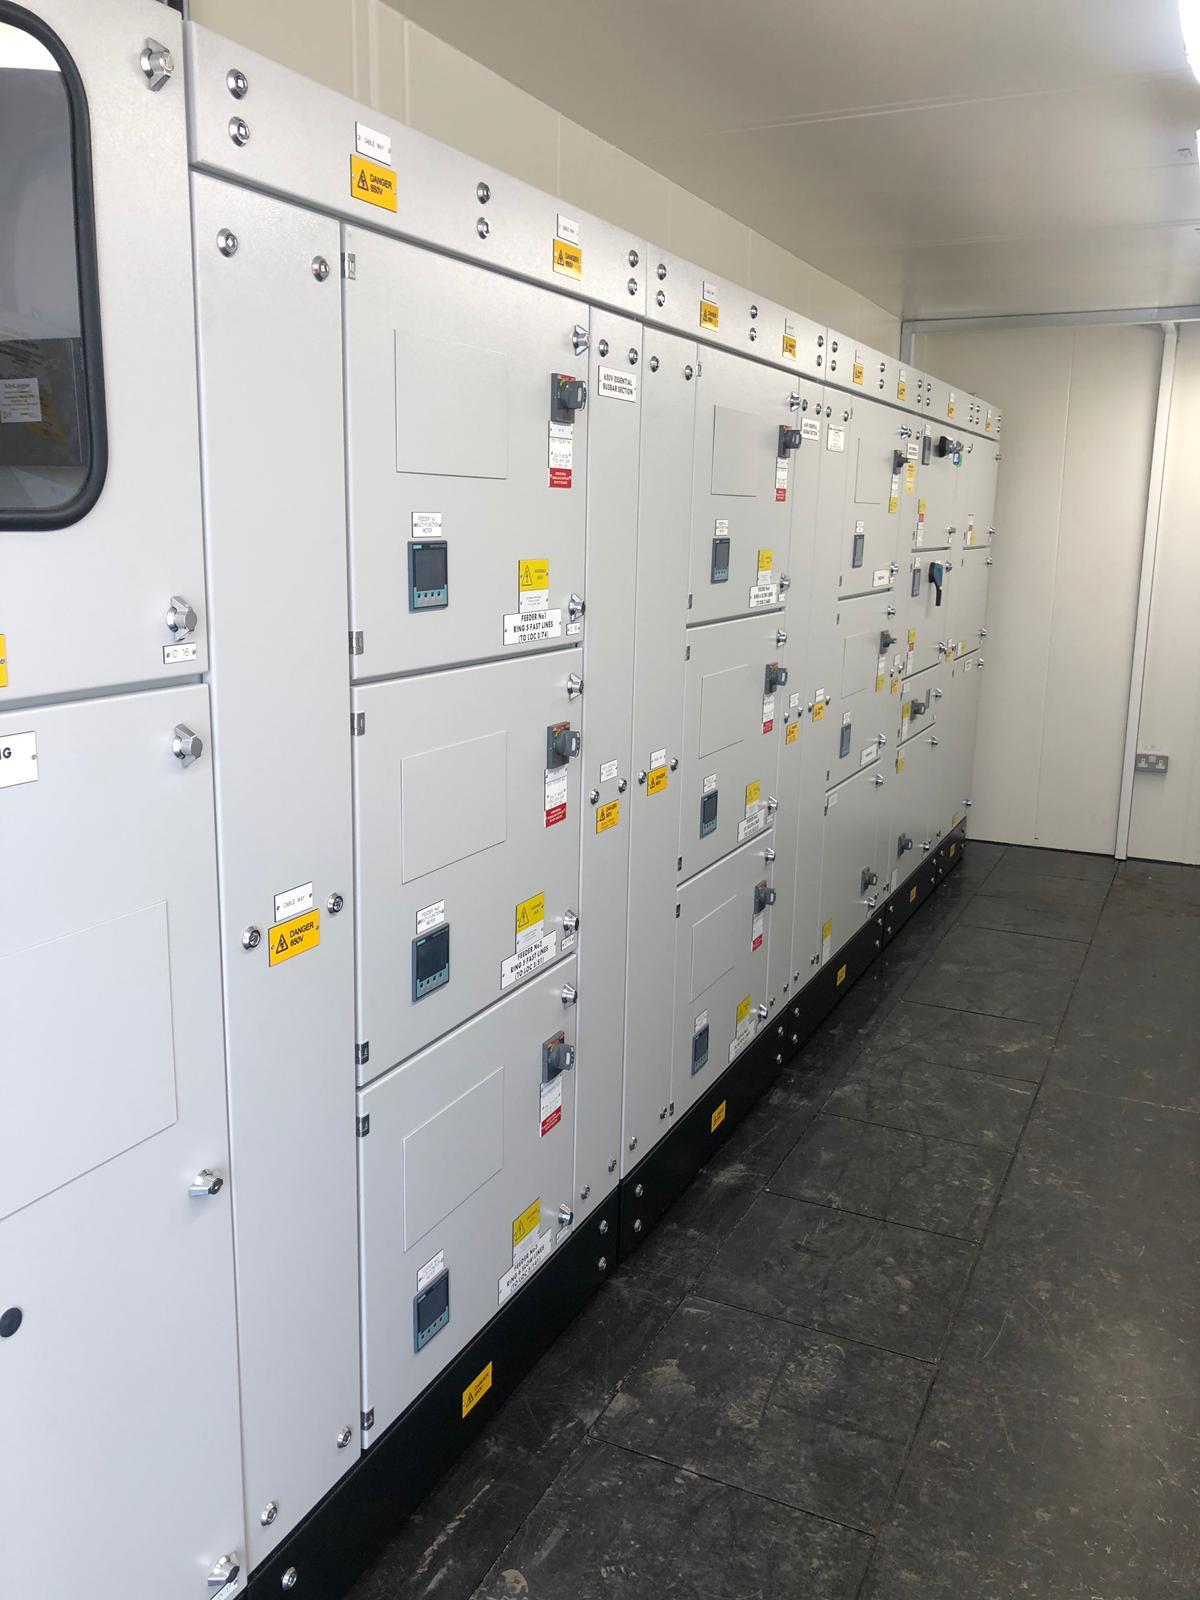 HS2 Enabling Works - SVM Glasgow